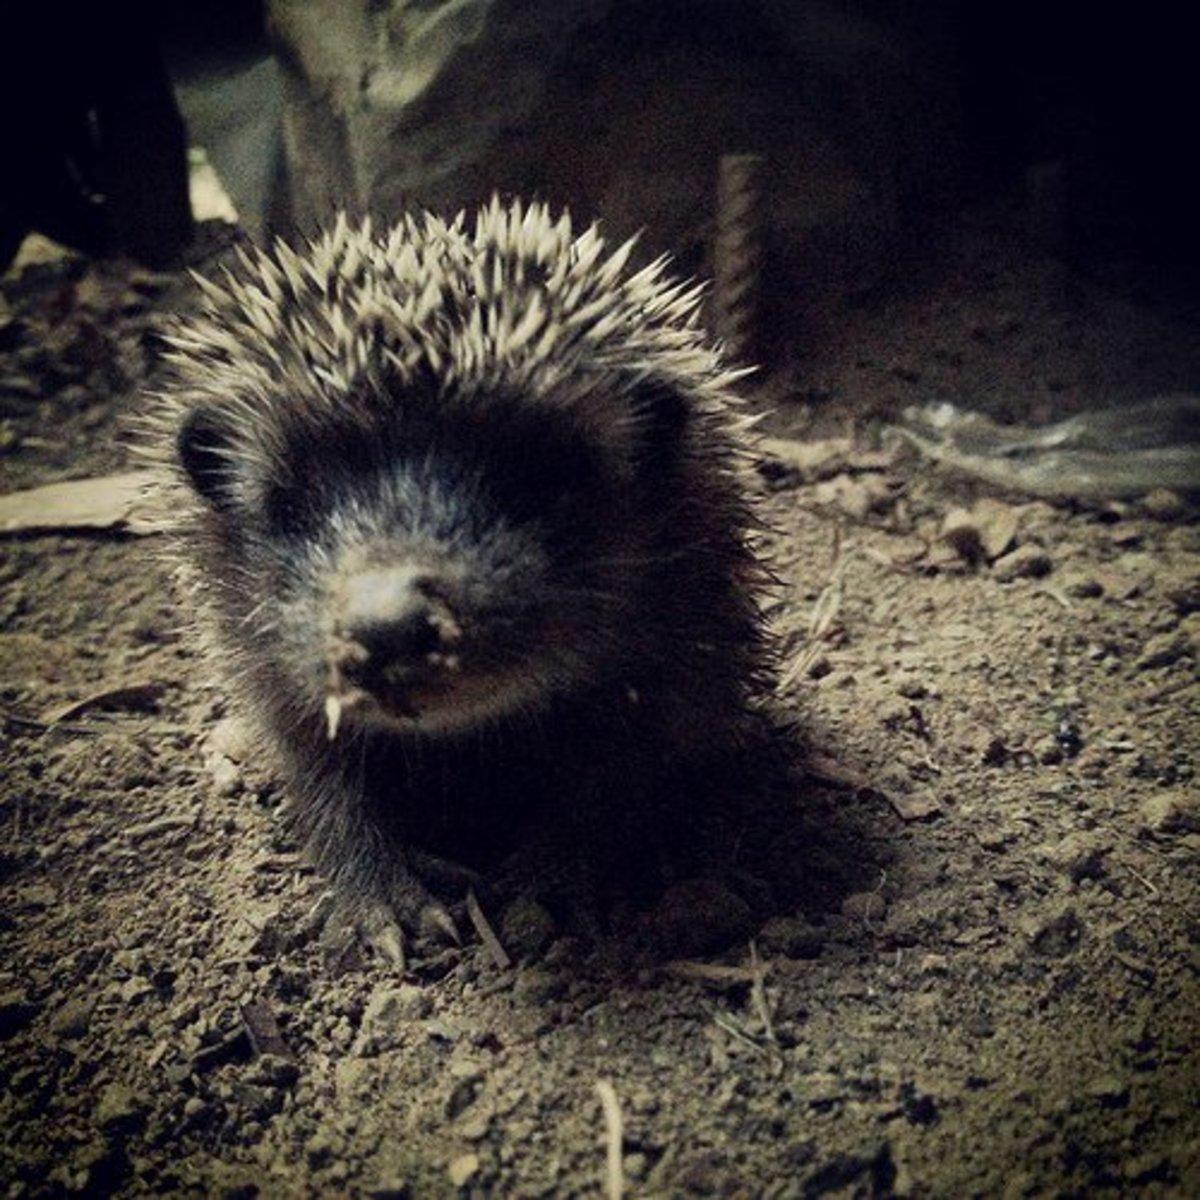 Hedgehog Foraging at Night